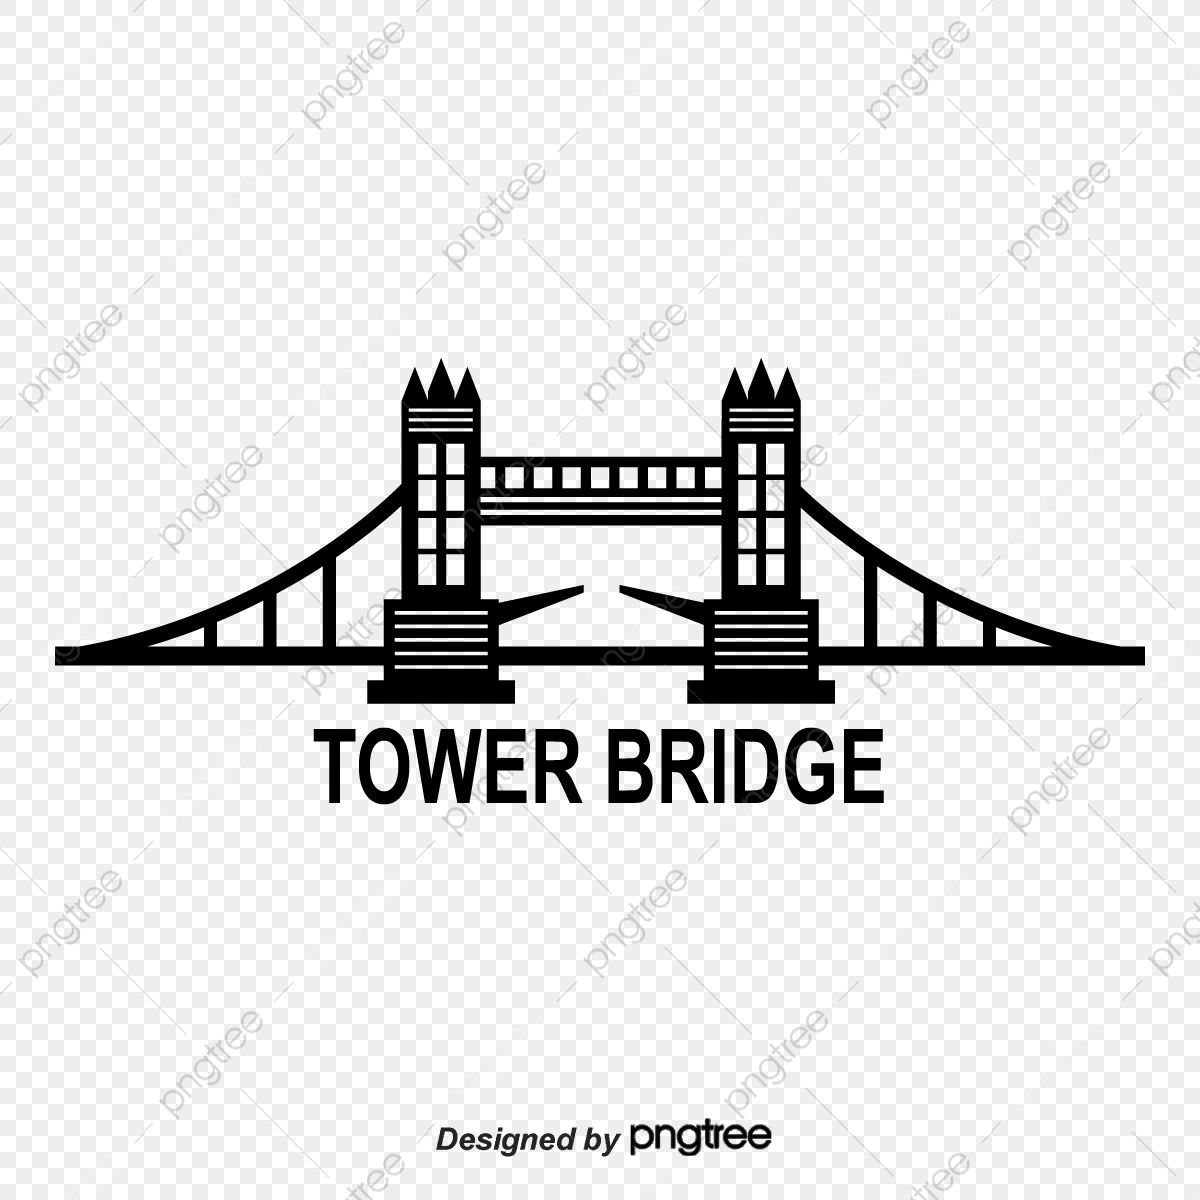 Google Image Result For Https Png Pngtree Com Png Clipart 20190630 Original Pngtree Vector Flat British Big Ben Geometric Clip Art Png Architectural Elements